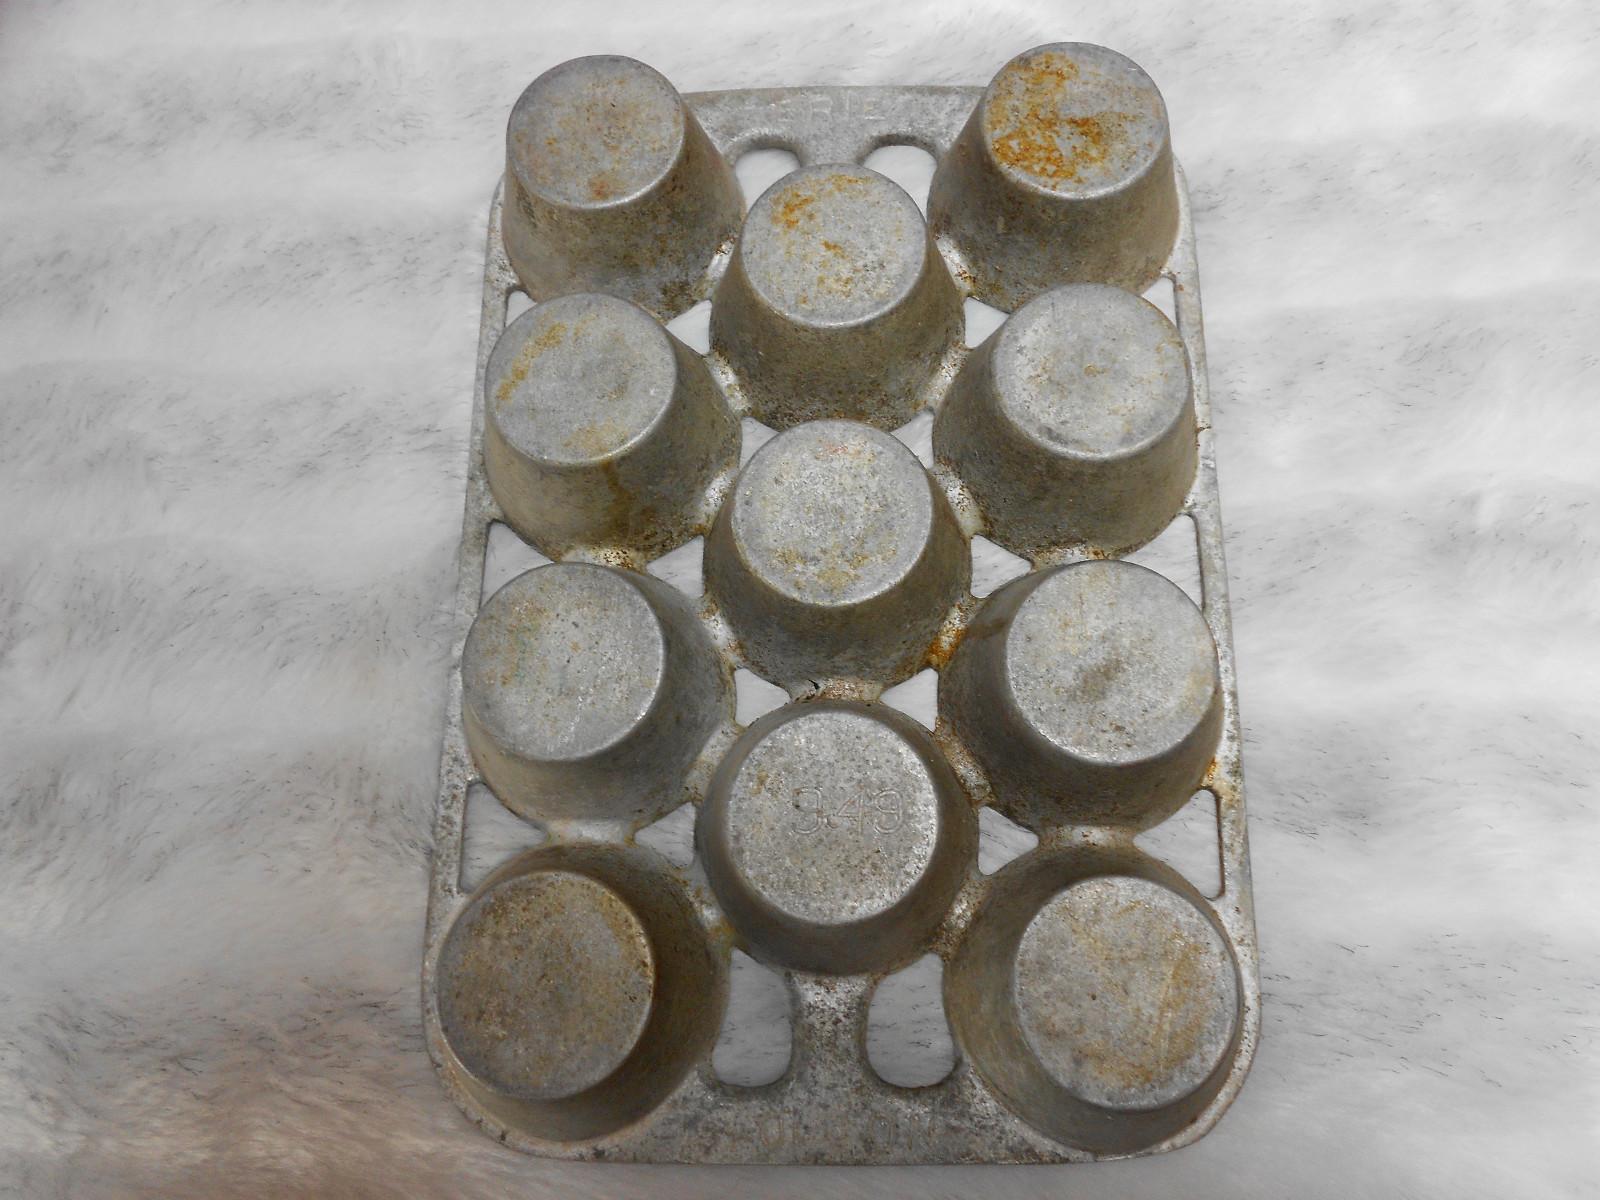 Erie Muffin Pan bottom